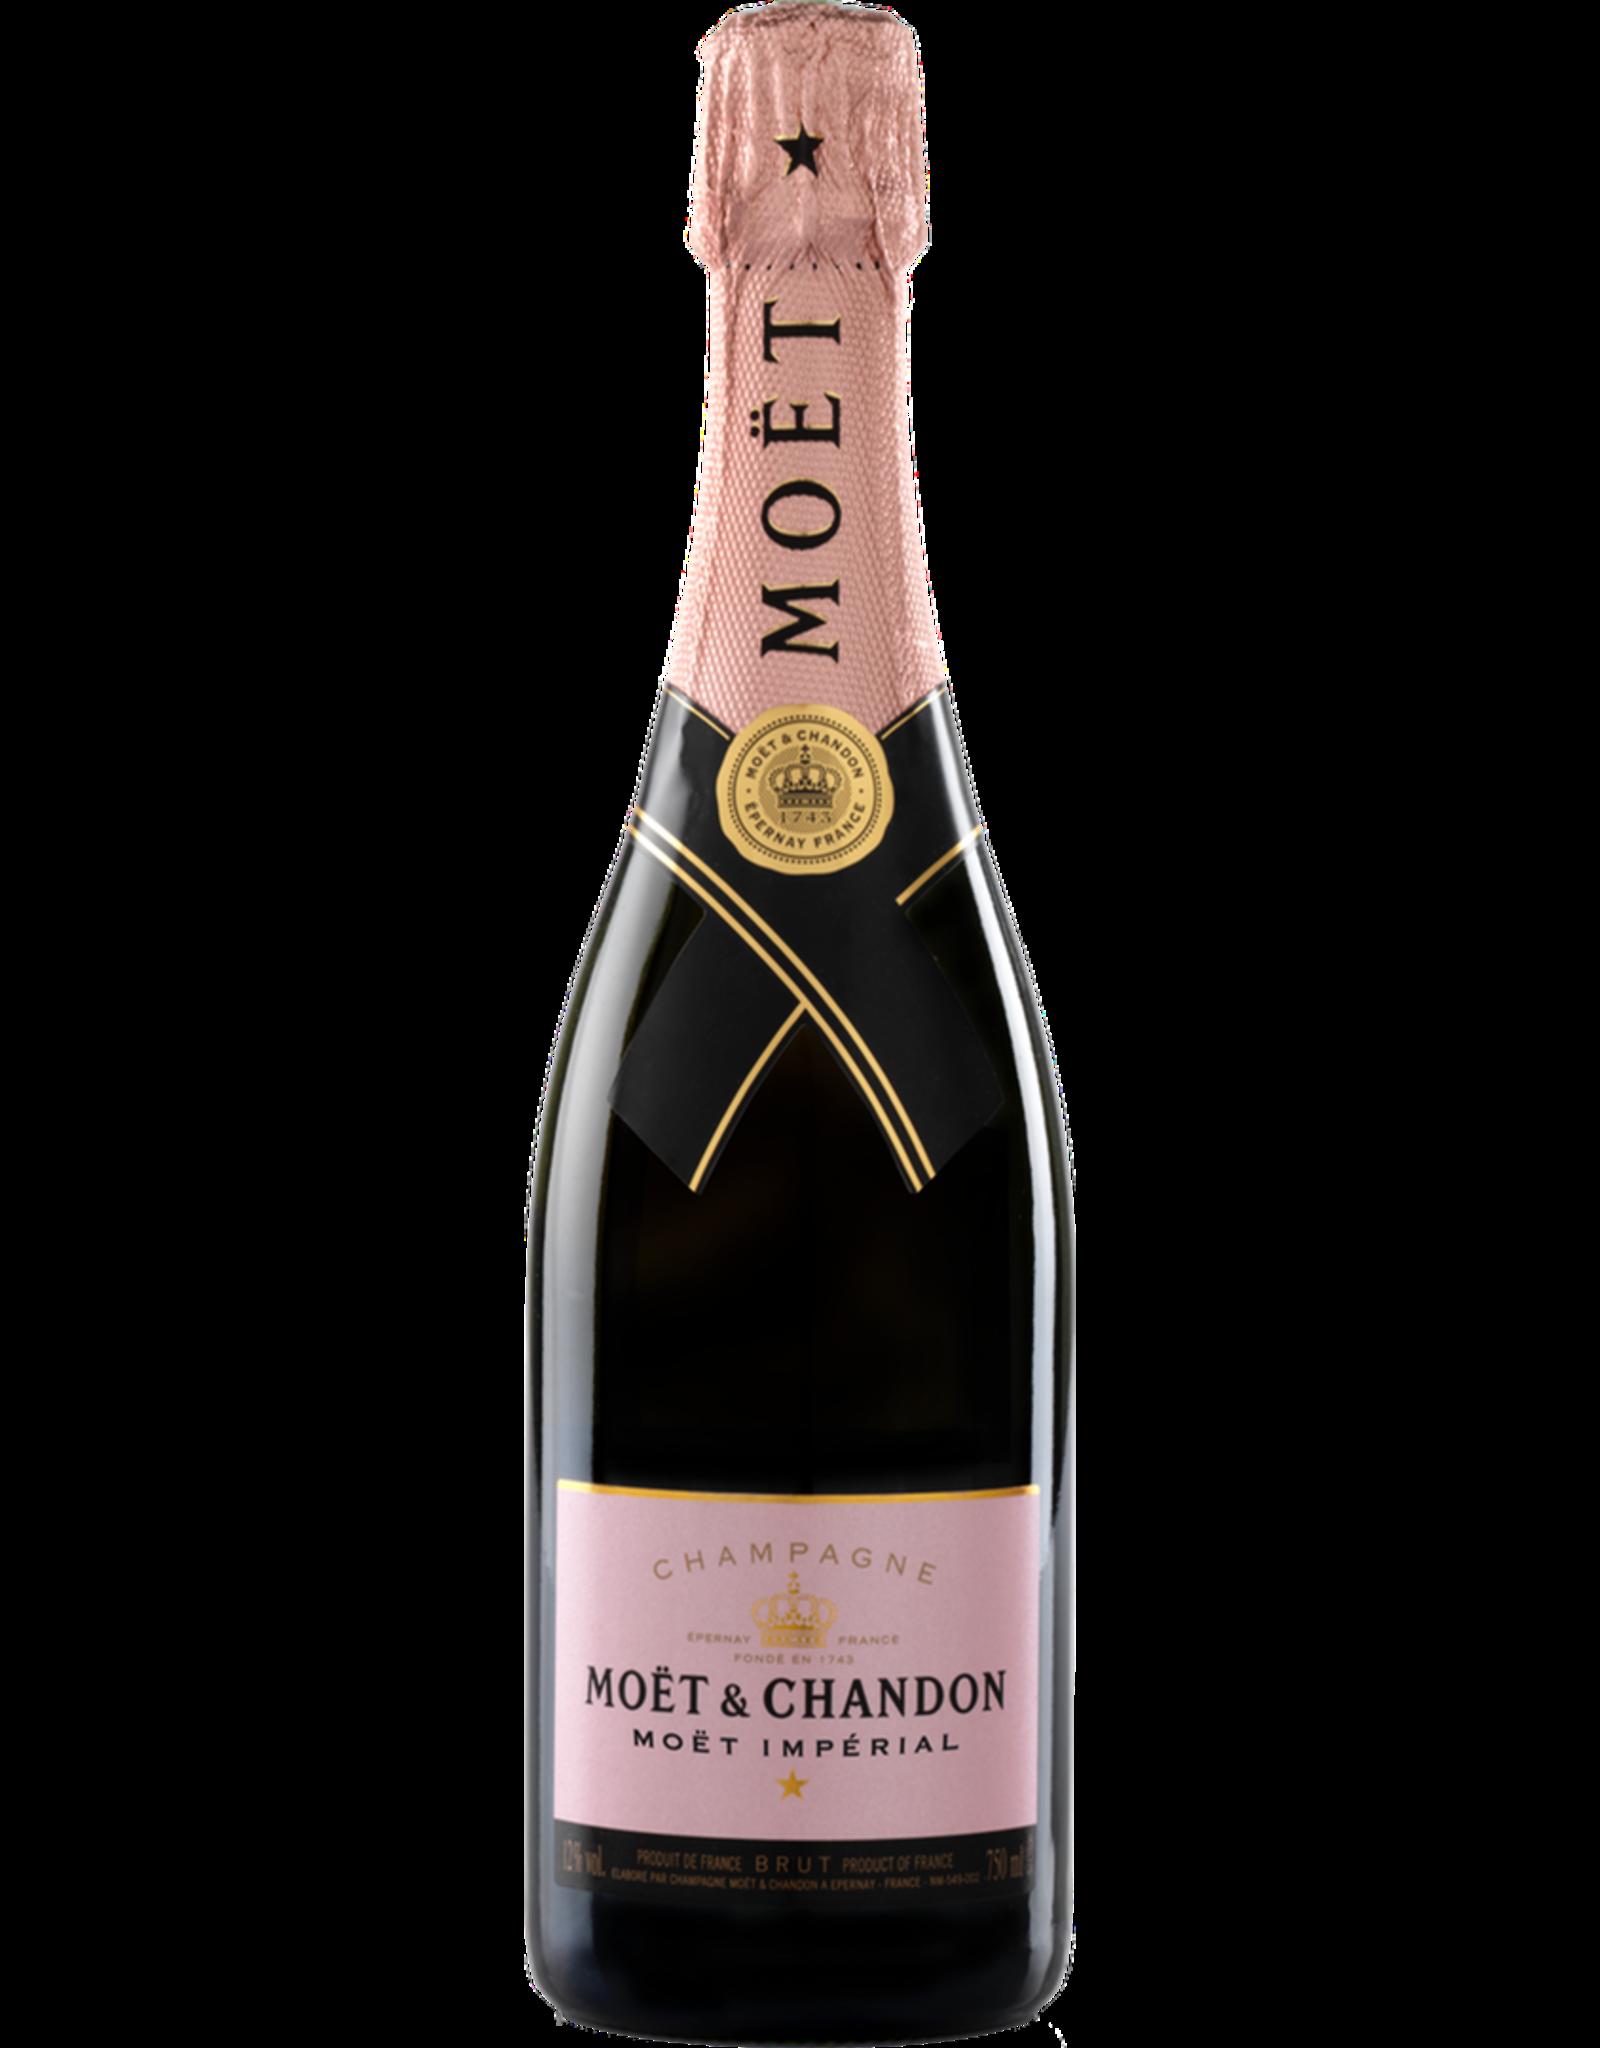 Moet & Chandon Moet & Chandon Rose Imp. GB 0.375